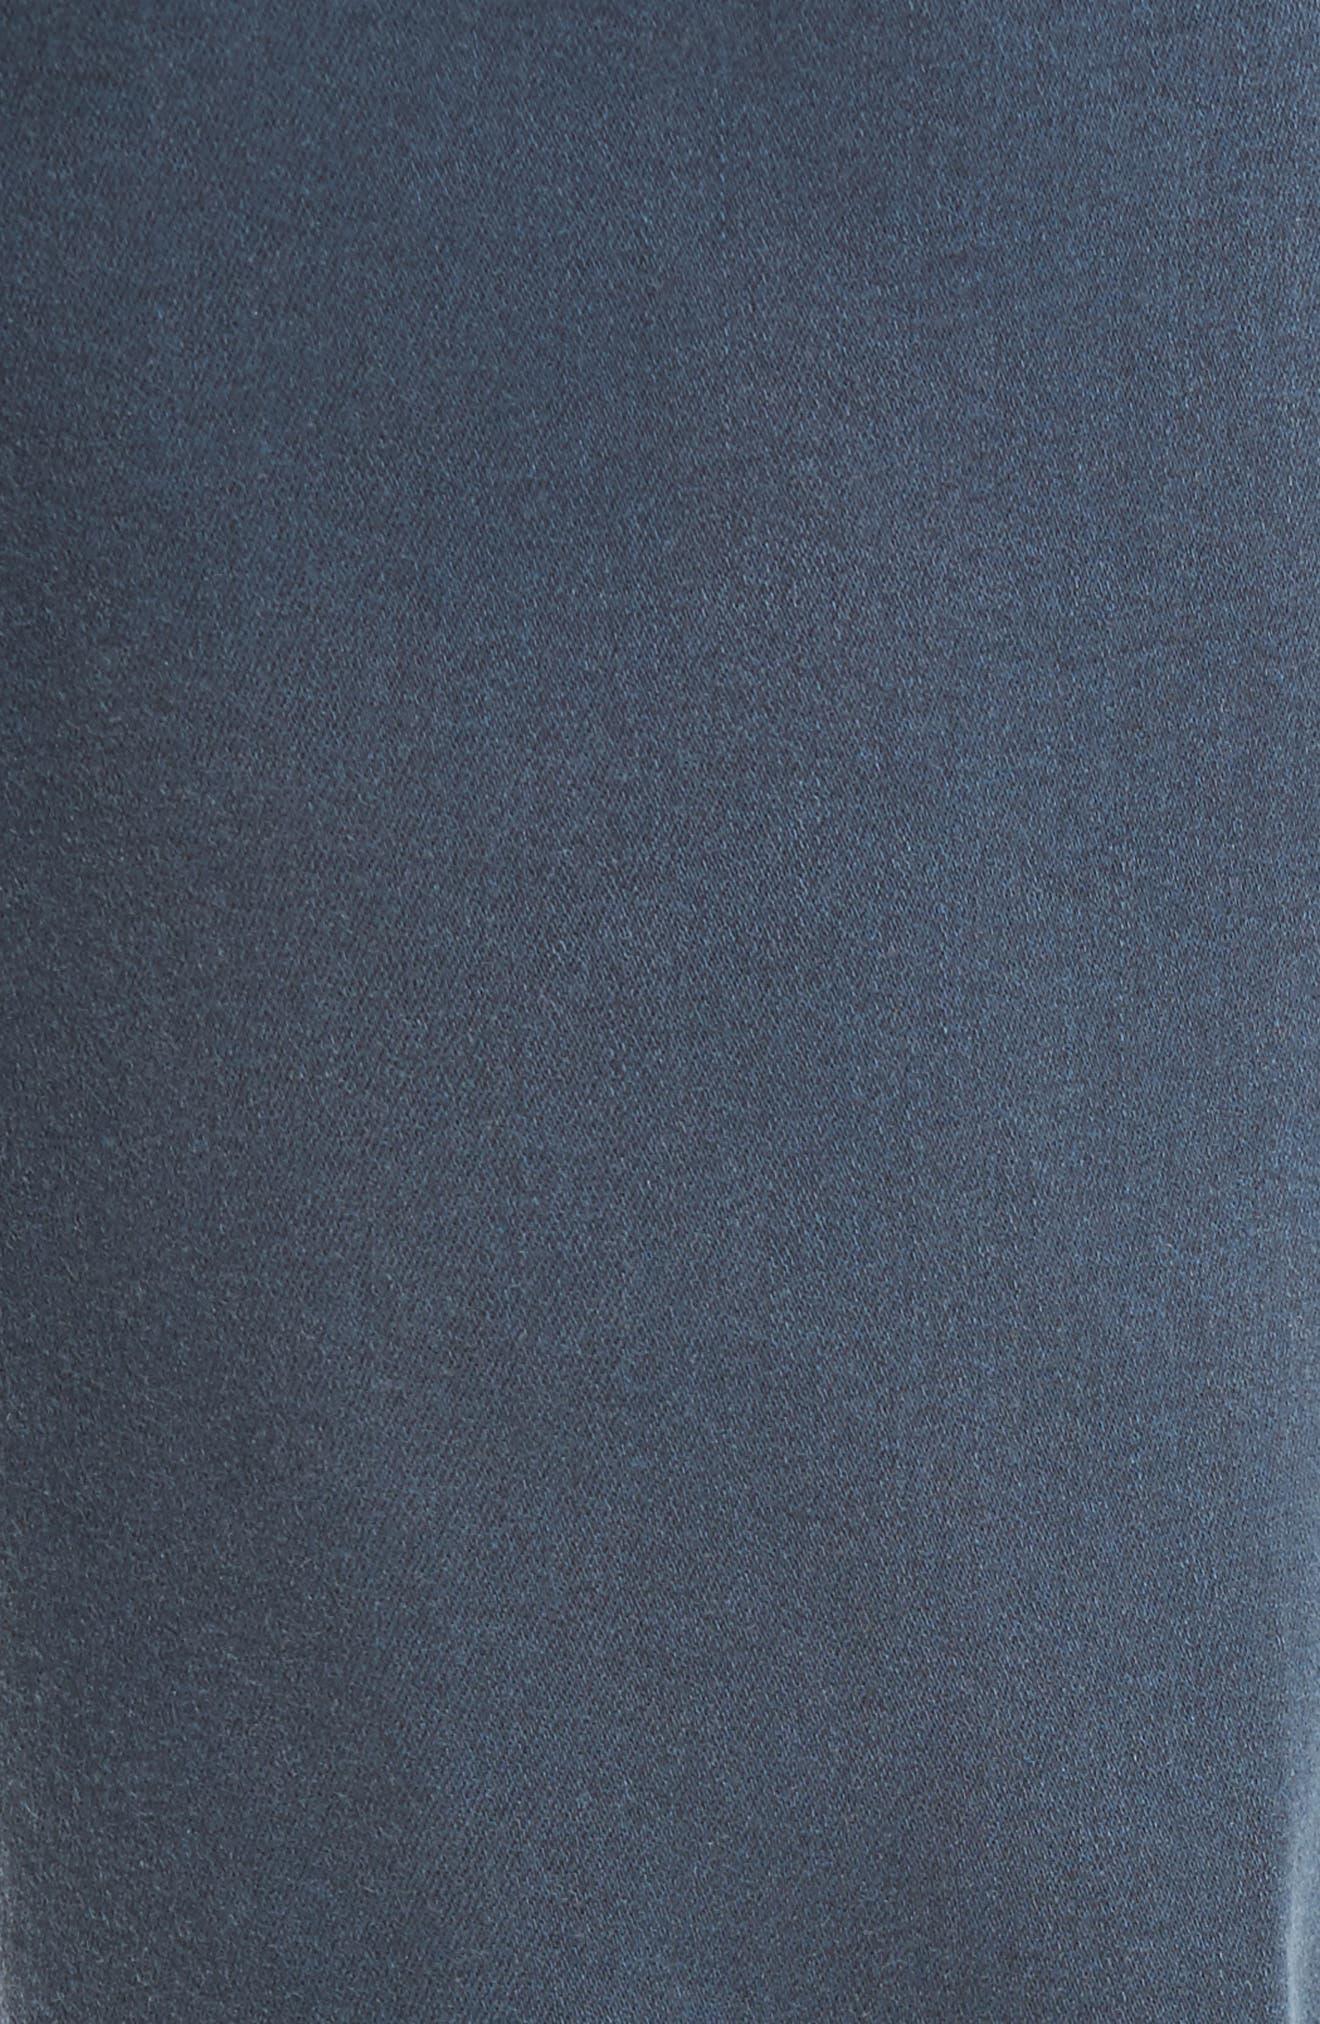 Lennox Slim Fit Jeans,                             Alternate thumbnail 5, color,                             Vintage Amalfi